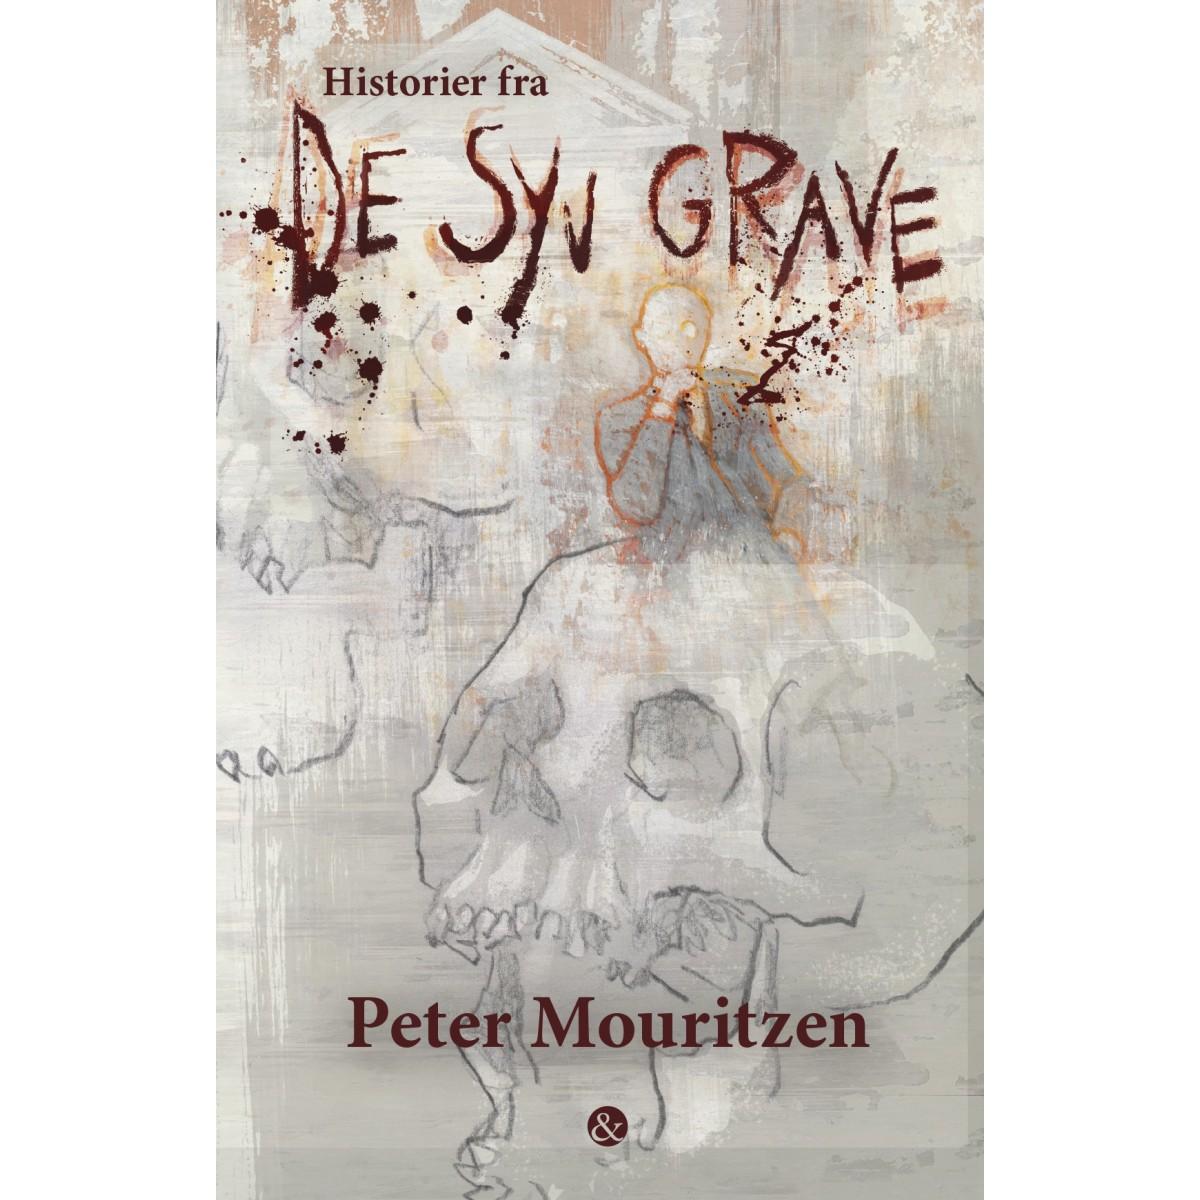 Peter Mouritzen: Historier fra de syv grave